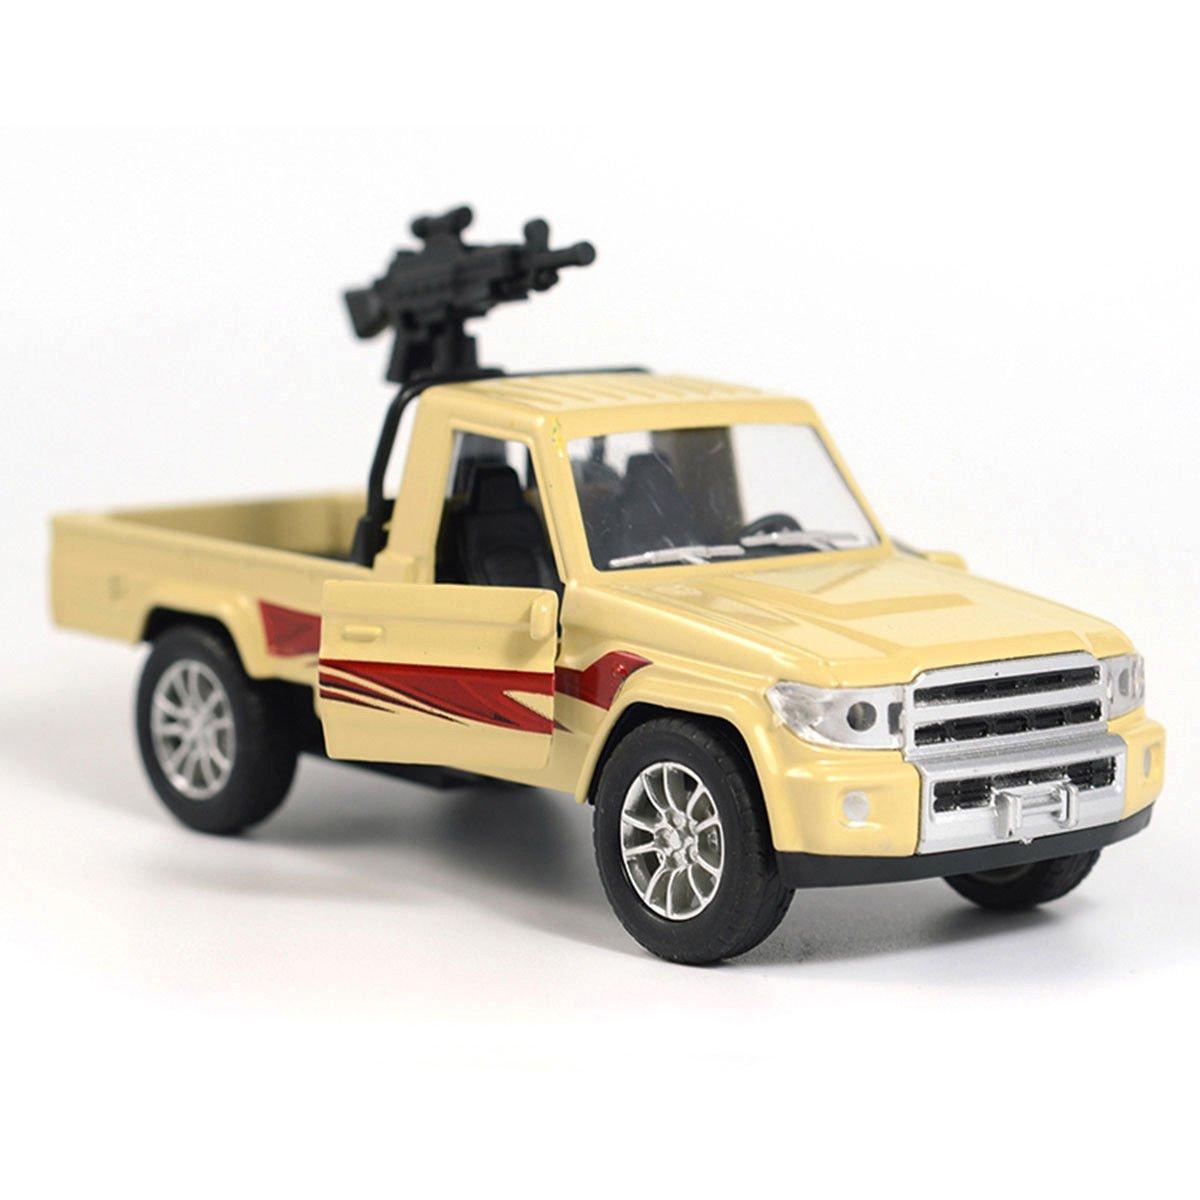 1:28 Military Pickup Truck w/ Machine Gun Army Car Model Diecast Vehicle White